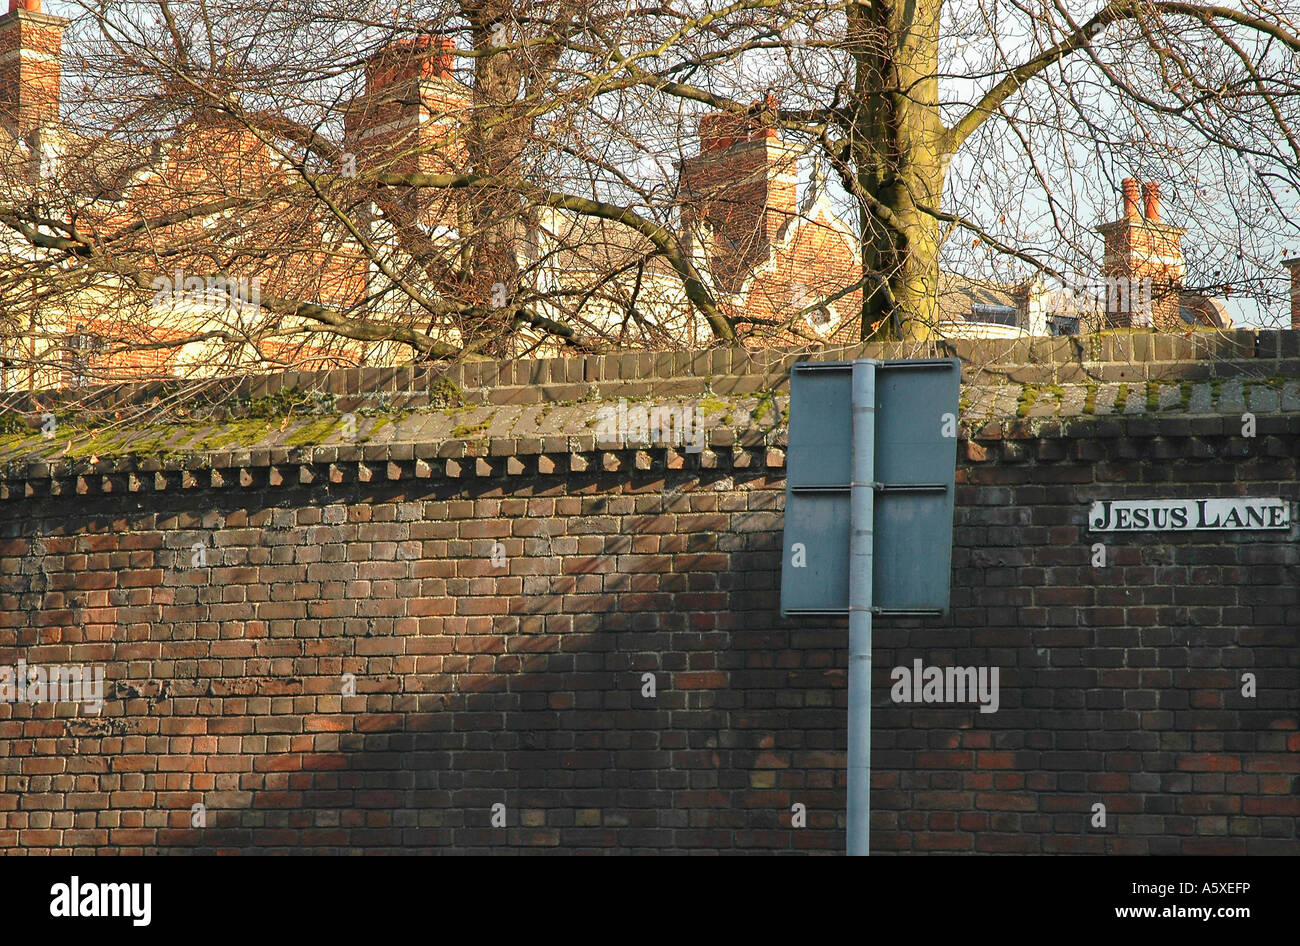 Painet iw1936 england cambridge university sidney sussex college jesus lane brick wall academy association asylum - Stock Image